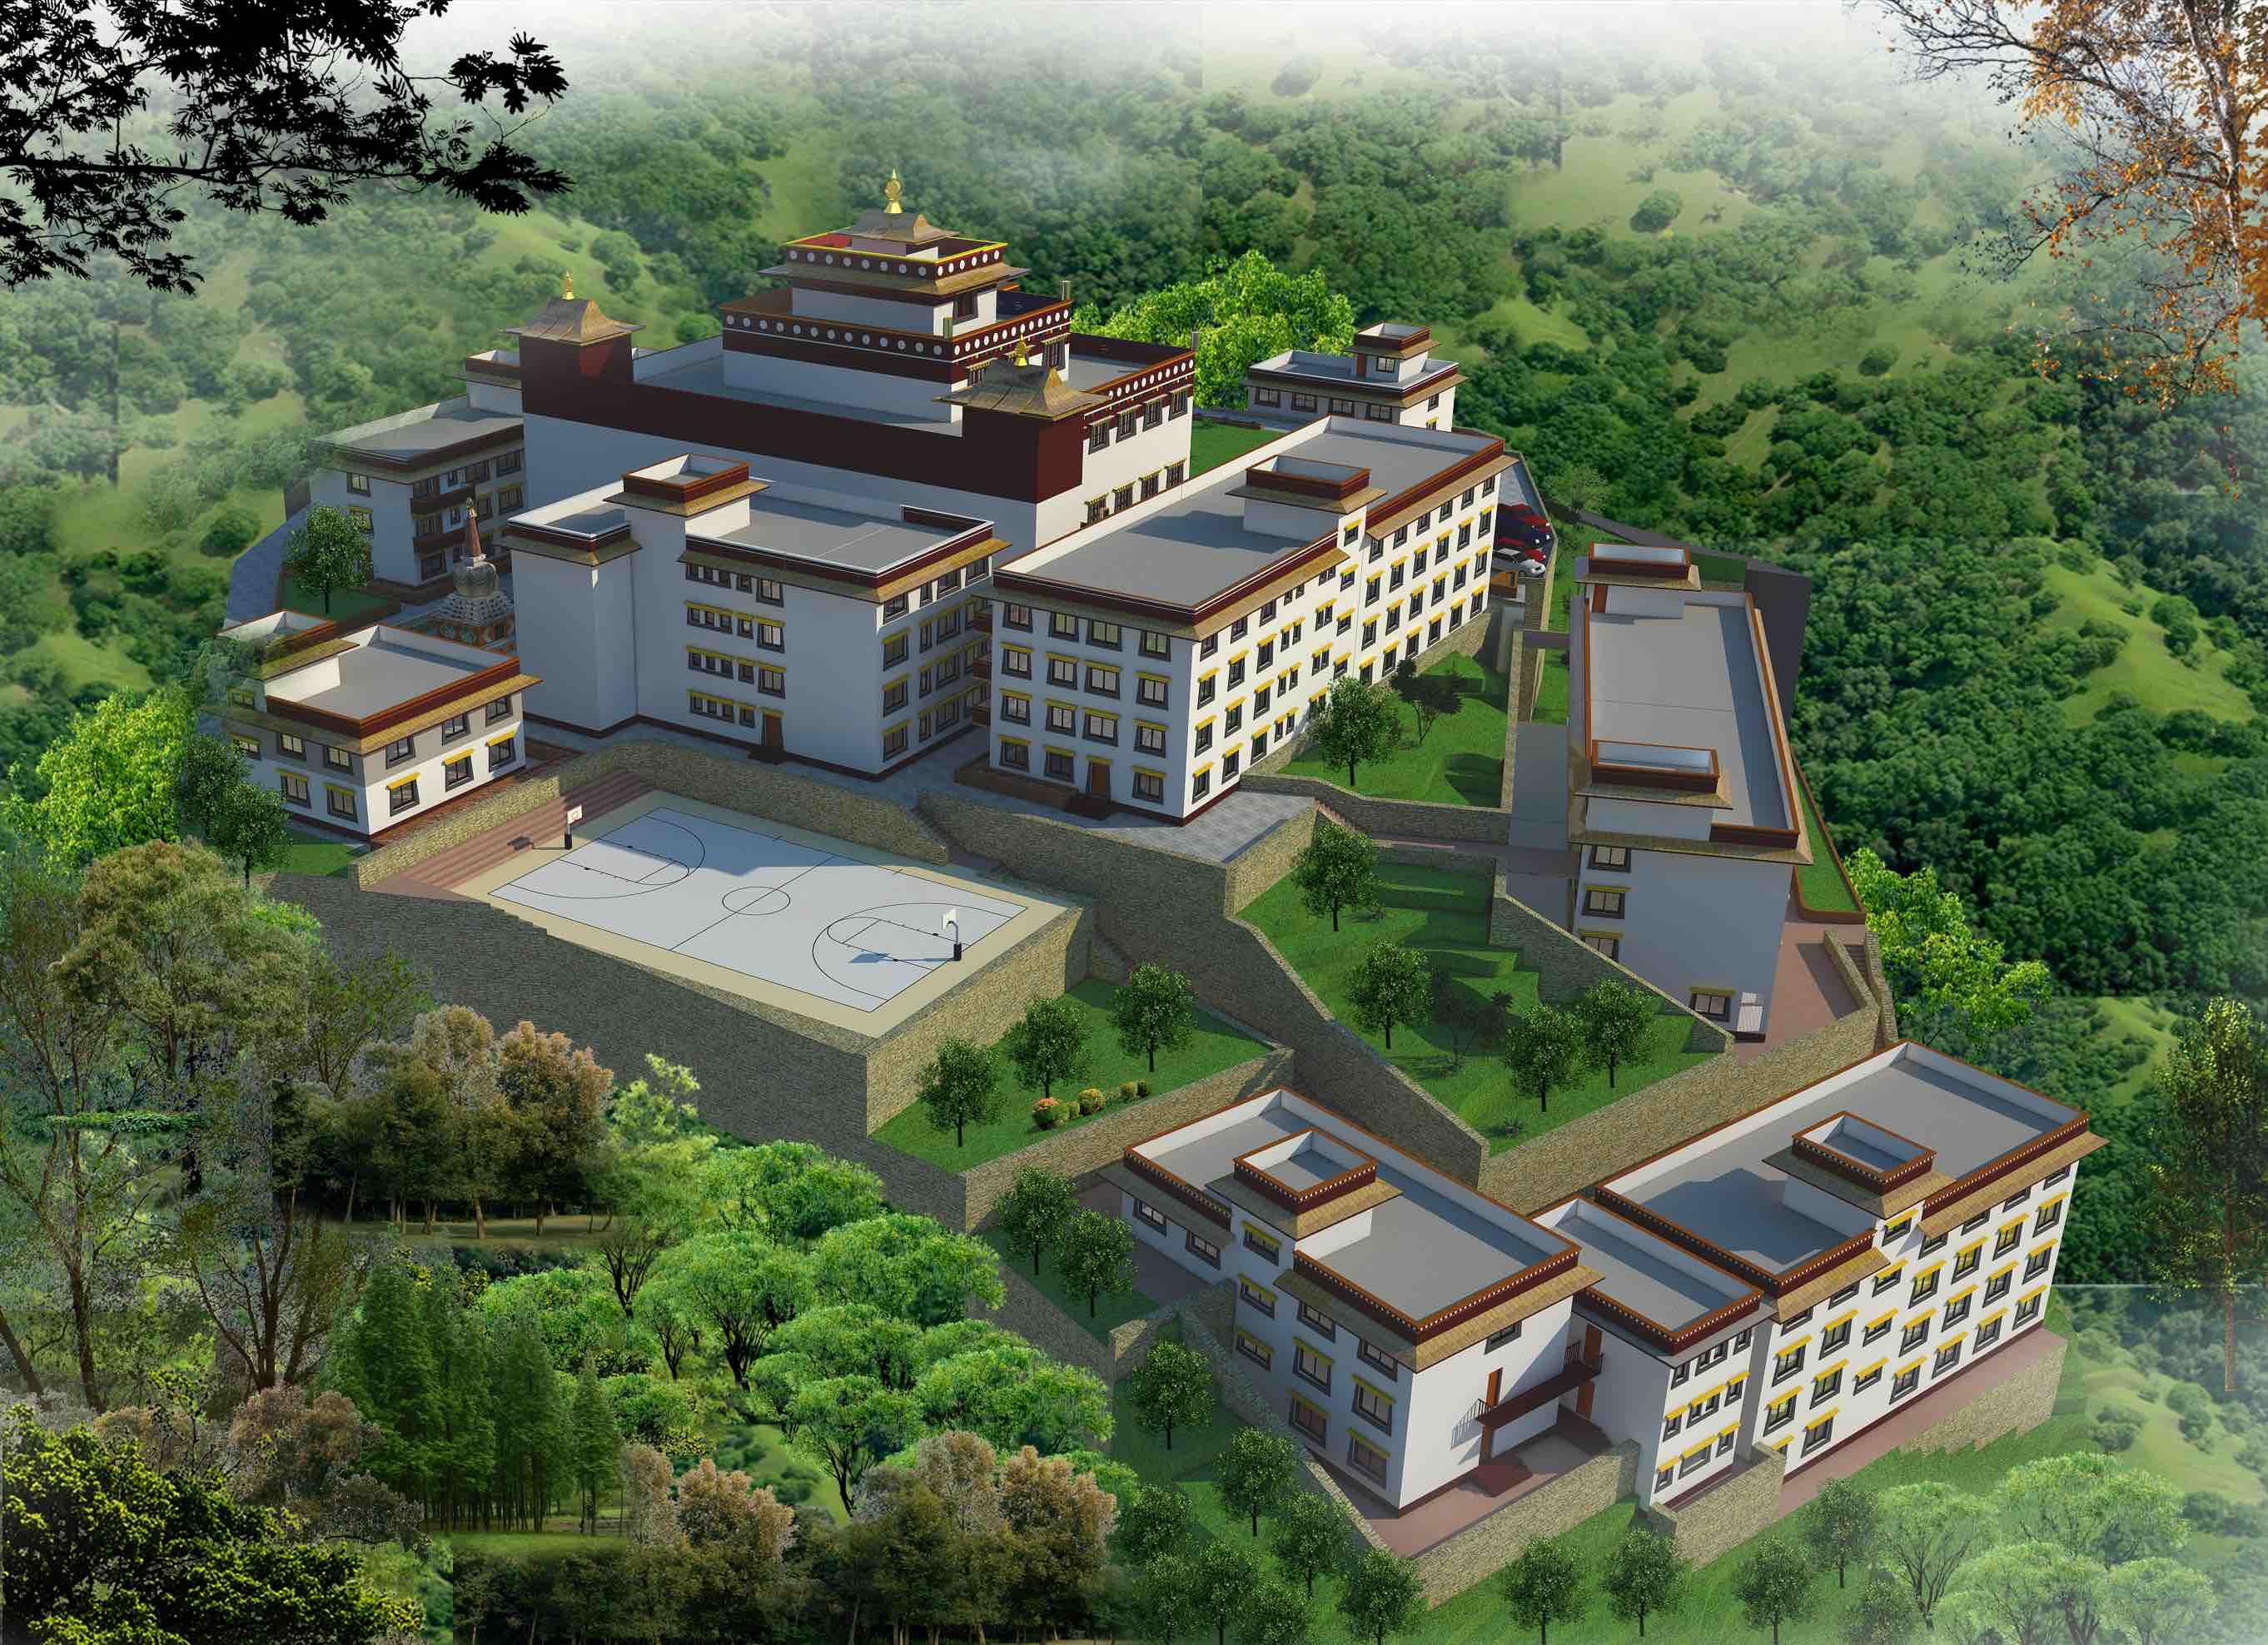 sankhu-school-3d-pic3-small